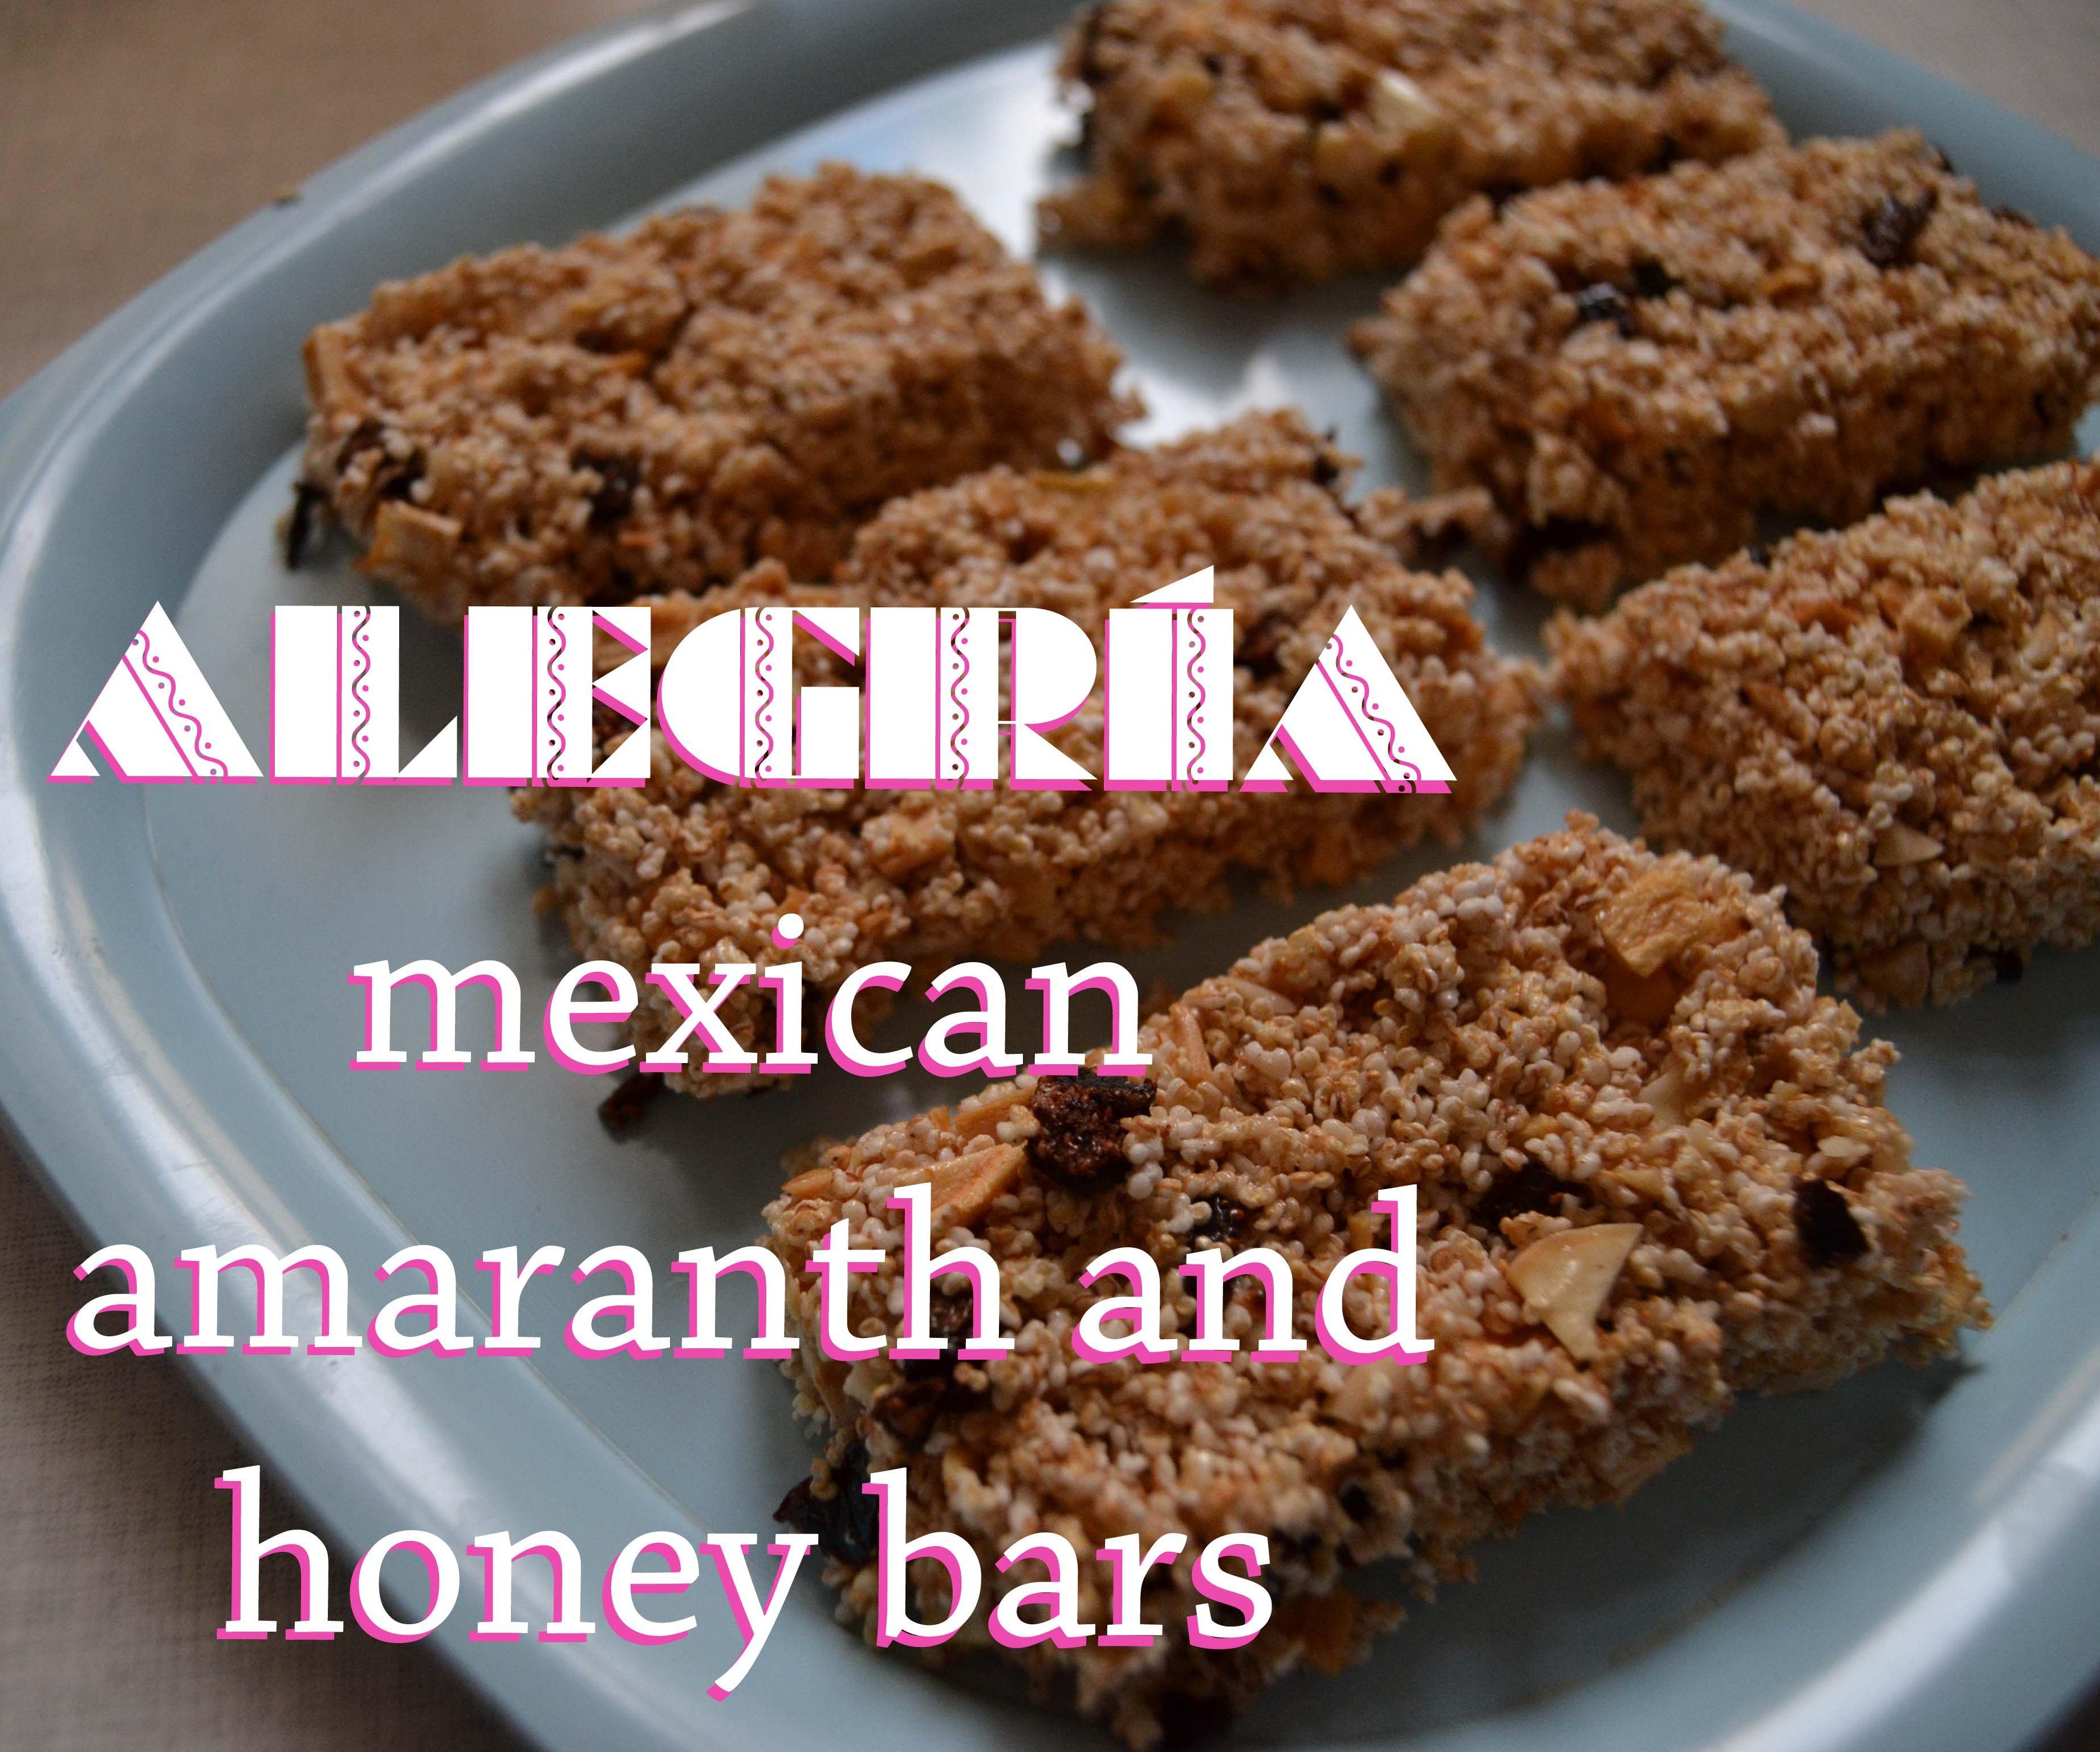 alegria - healthy mexican amaranth and honey bars